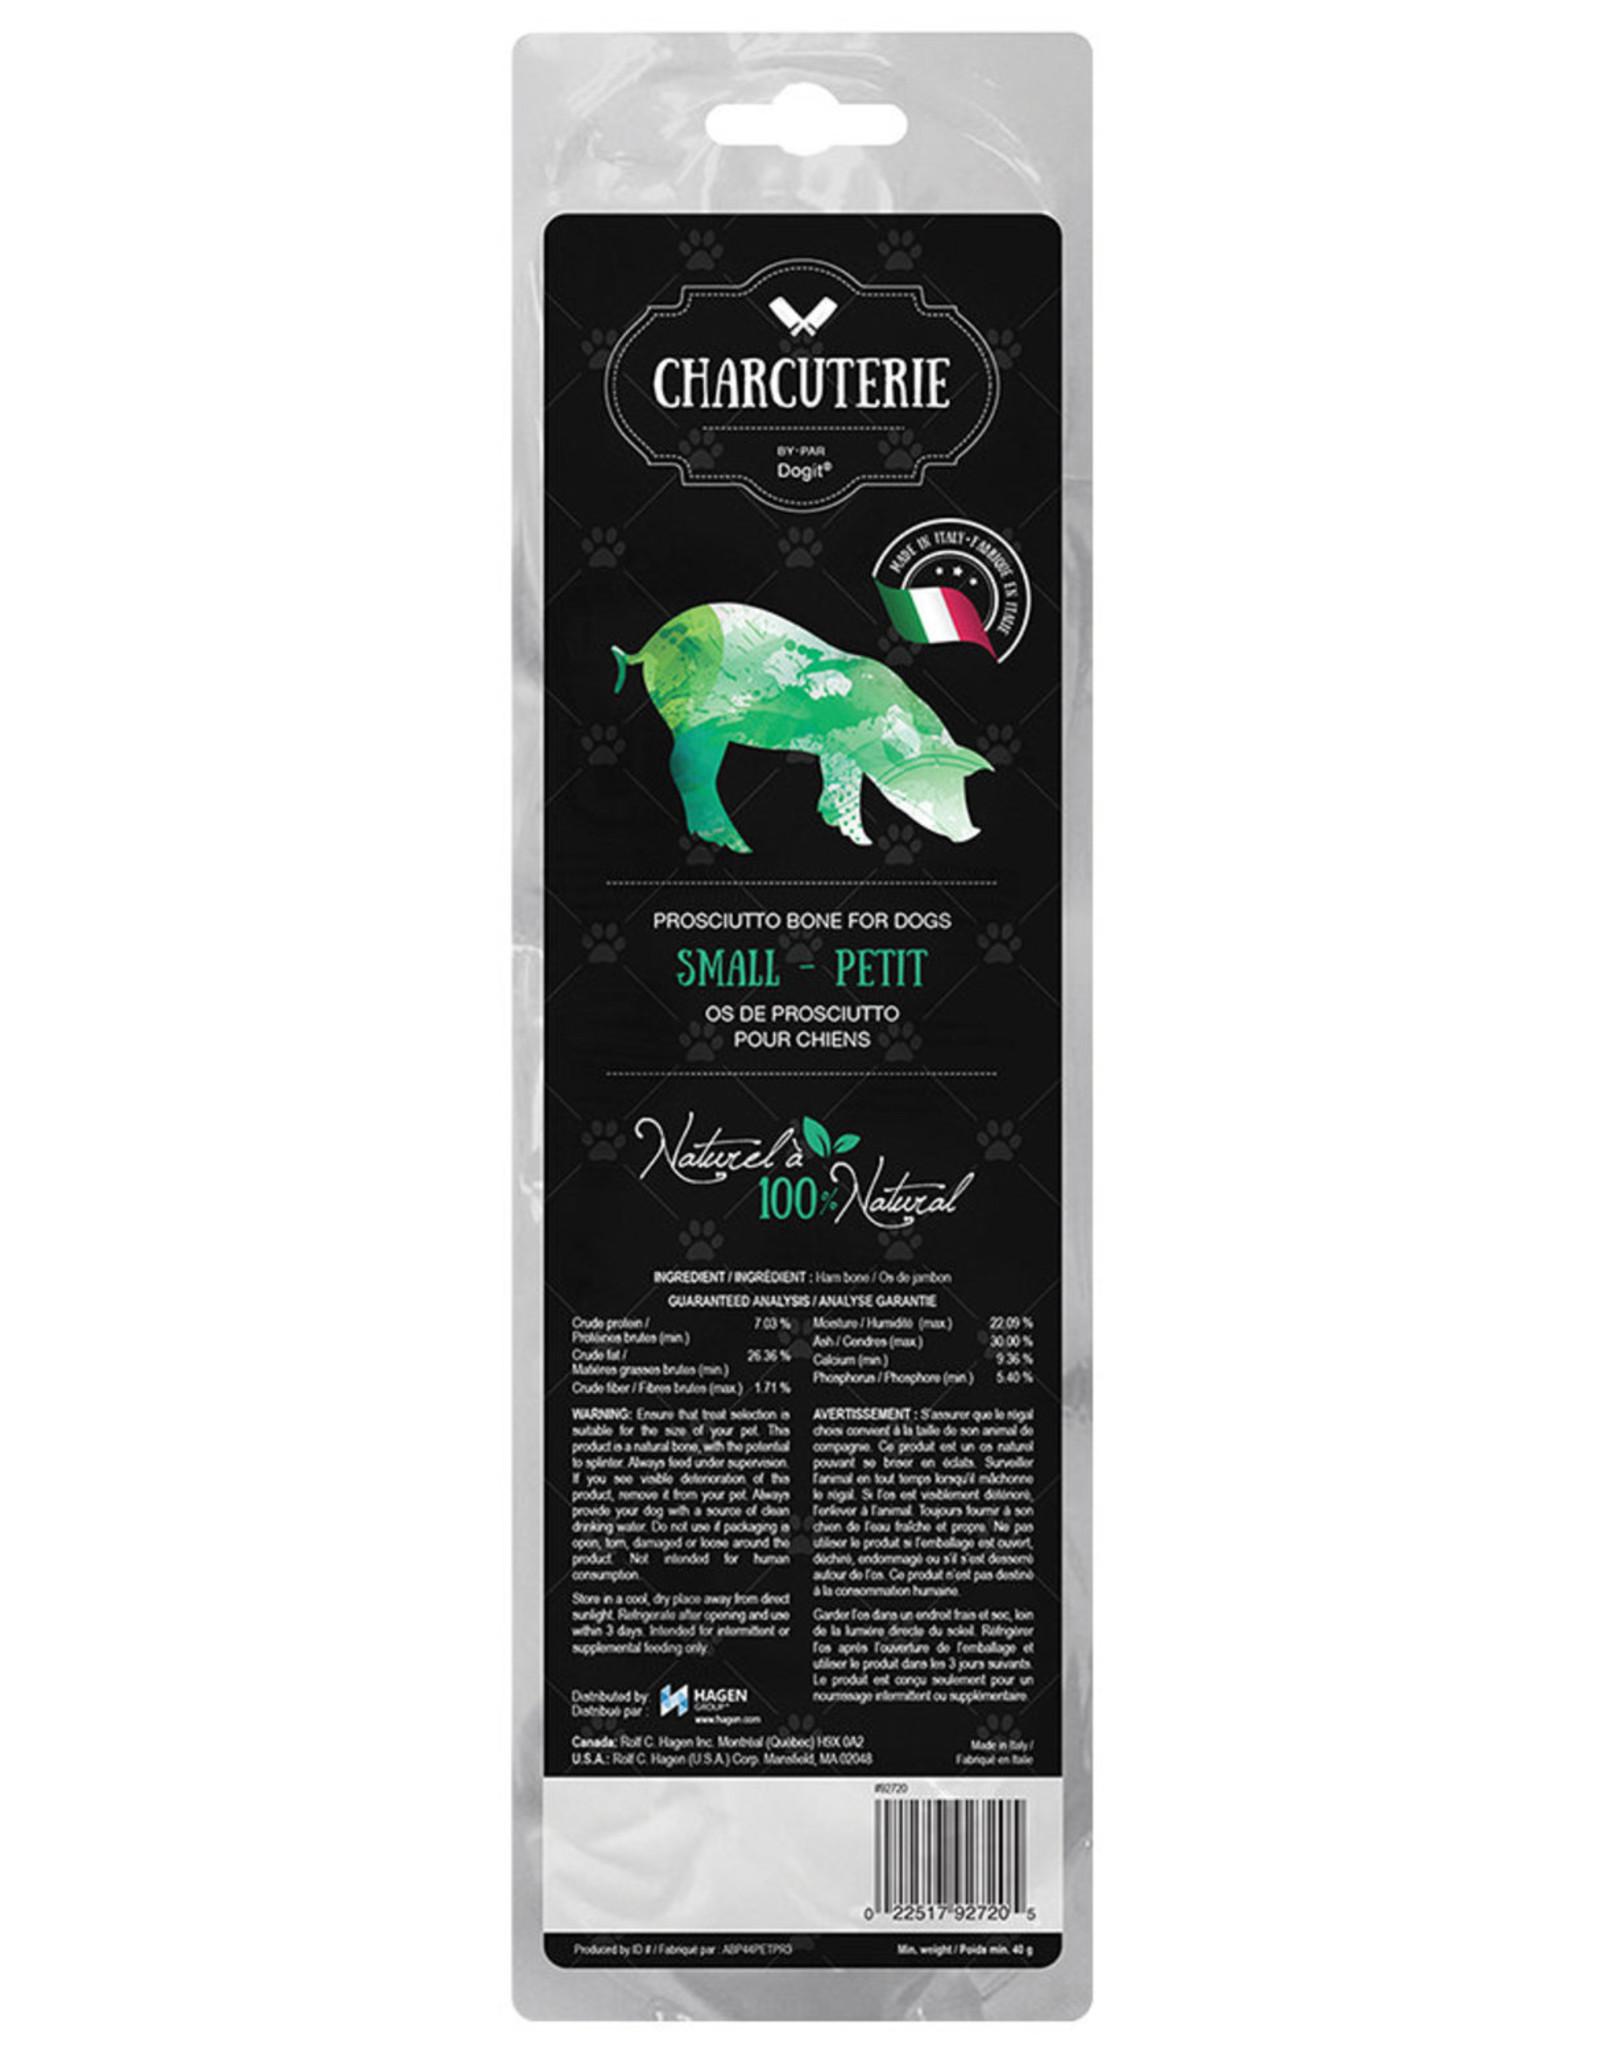 Dogit  Charcuterie Italian Ham Bone Small